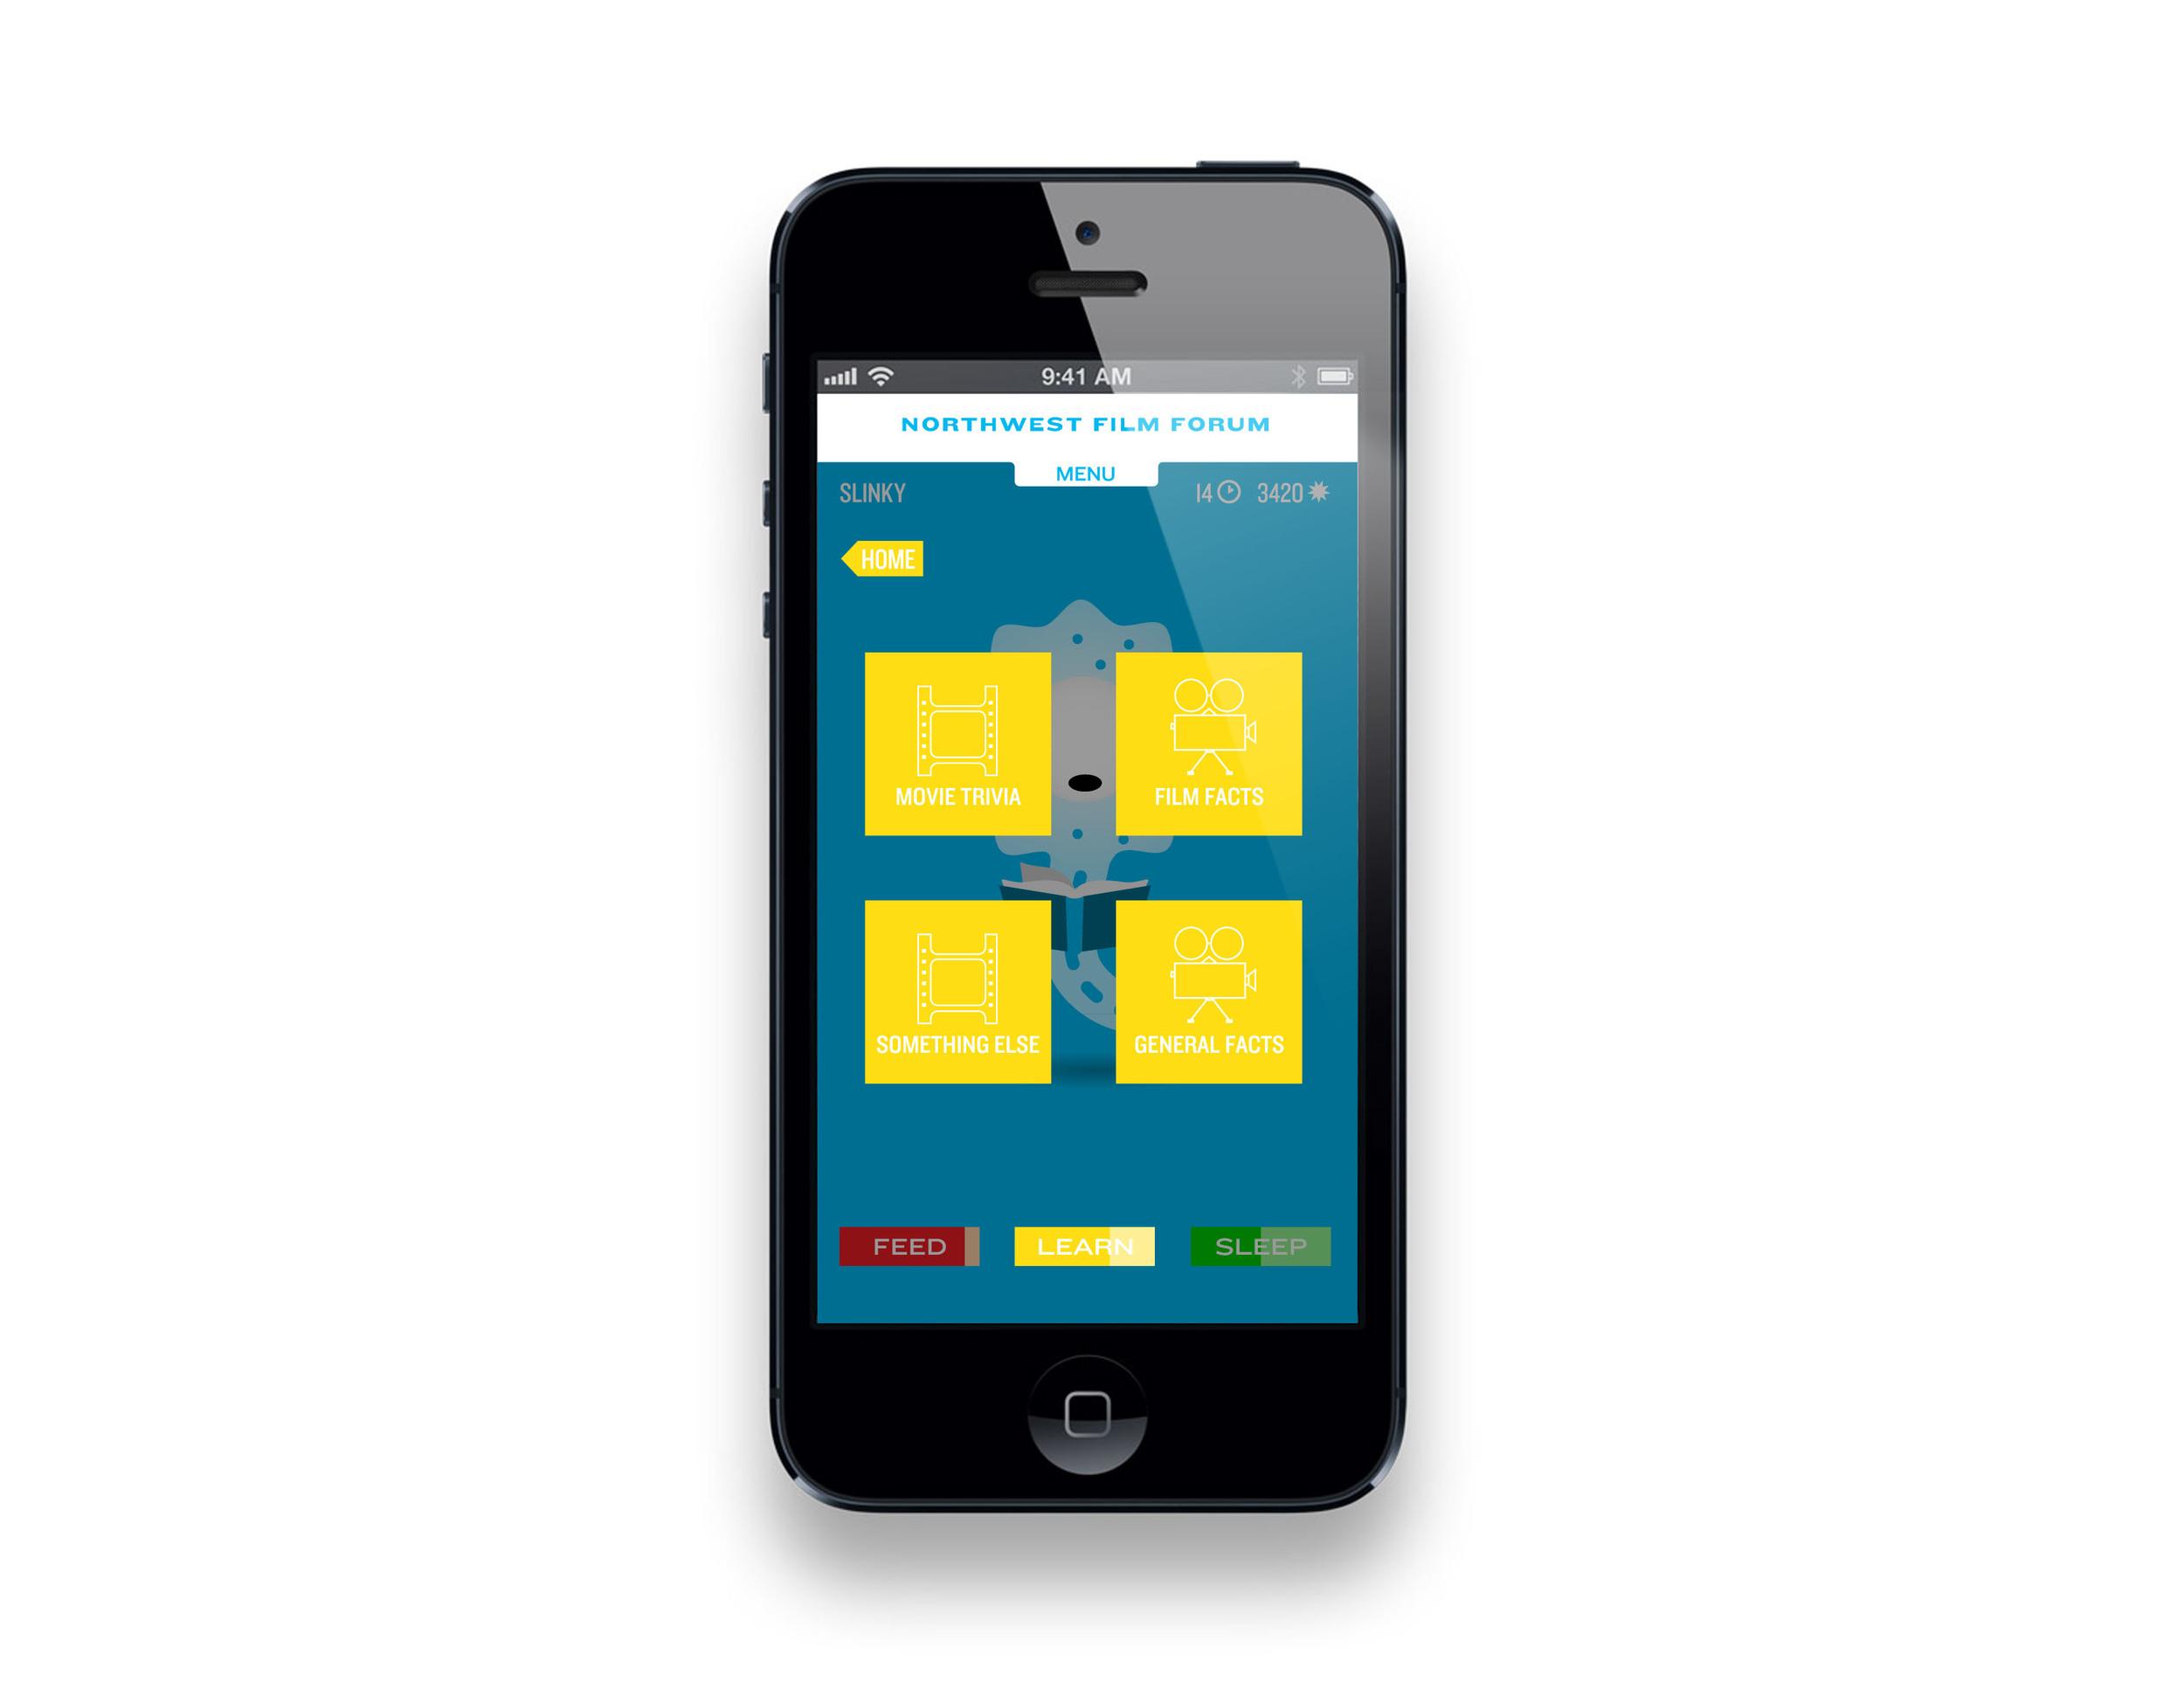 CFF_app_screen_0001s_0006_Group 1 copy 8.jpg